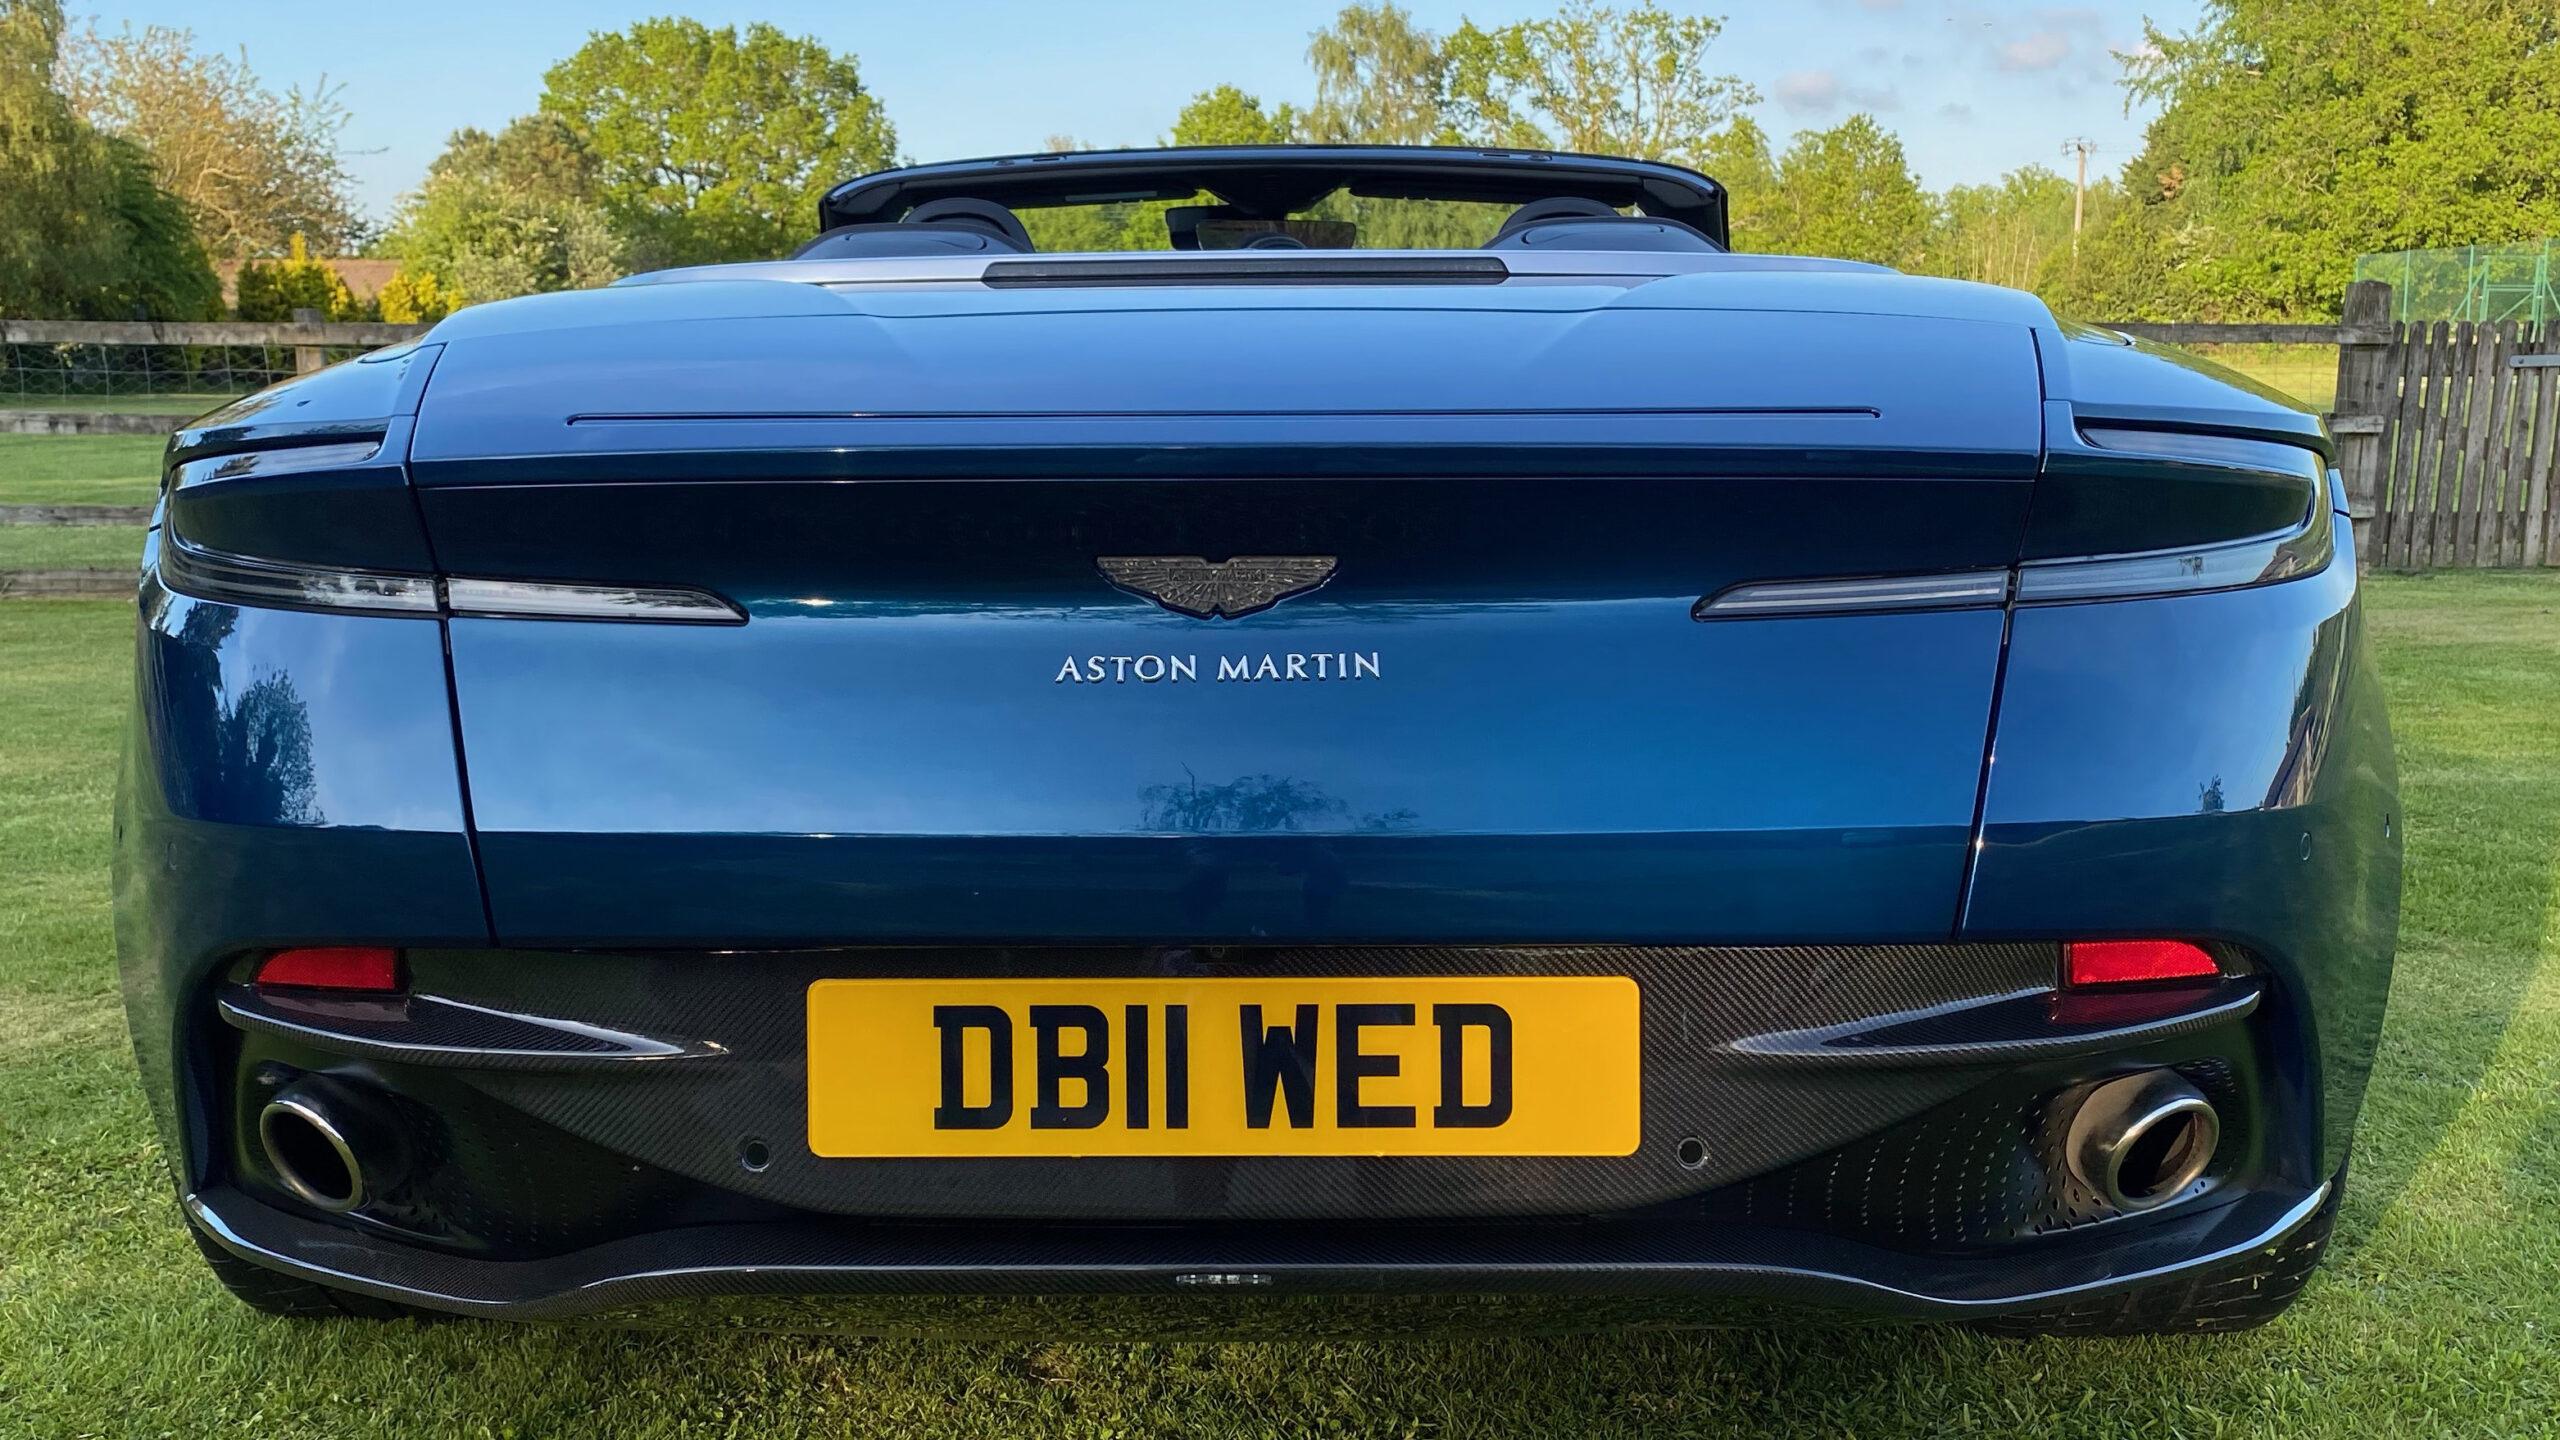 Aston Martin DB11 Convertible